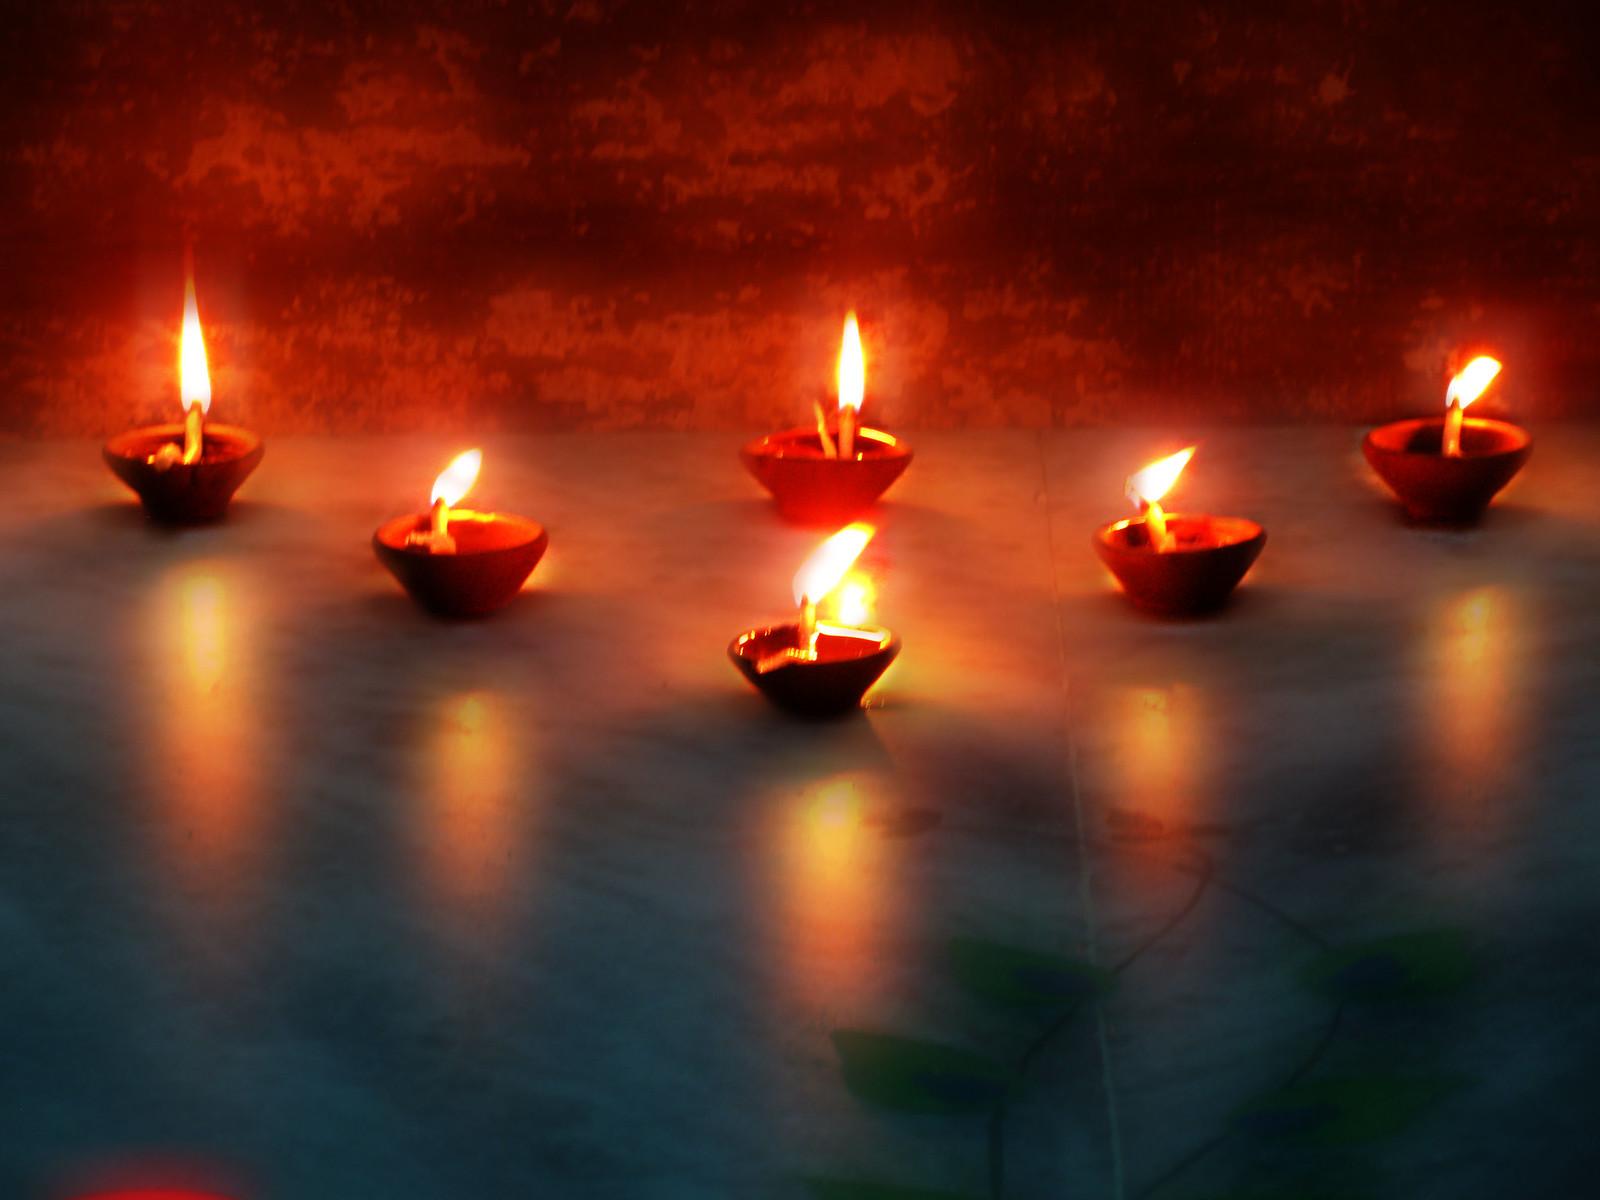 1000+ images about Diwali on Pinterest | Happy diwali, Hd ...